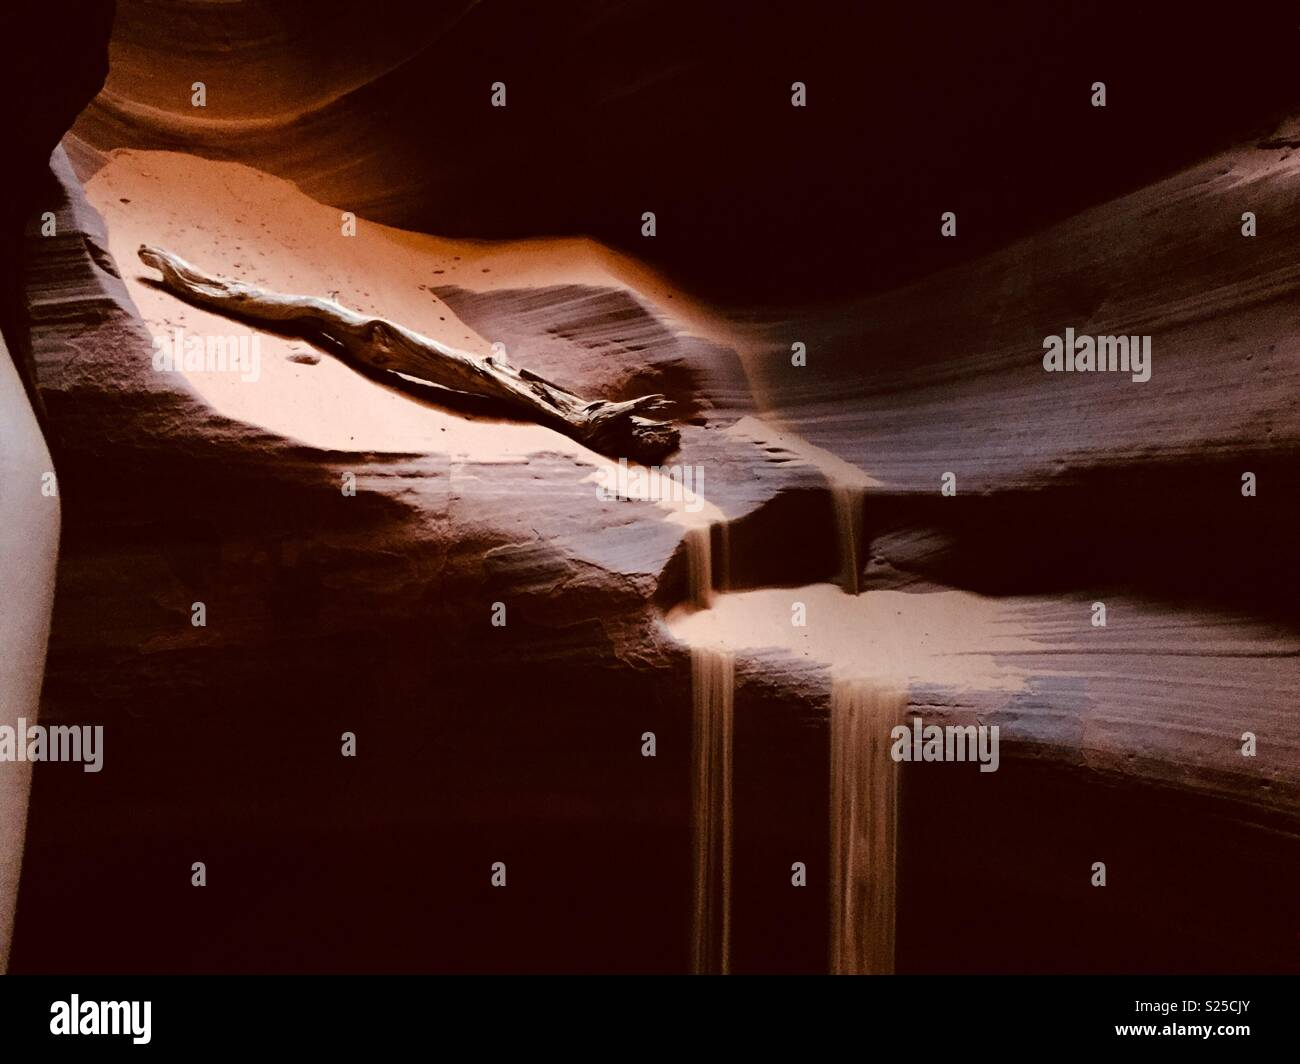 Cascate di sabbia Immagini Stock